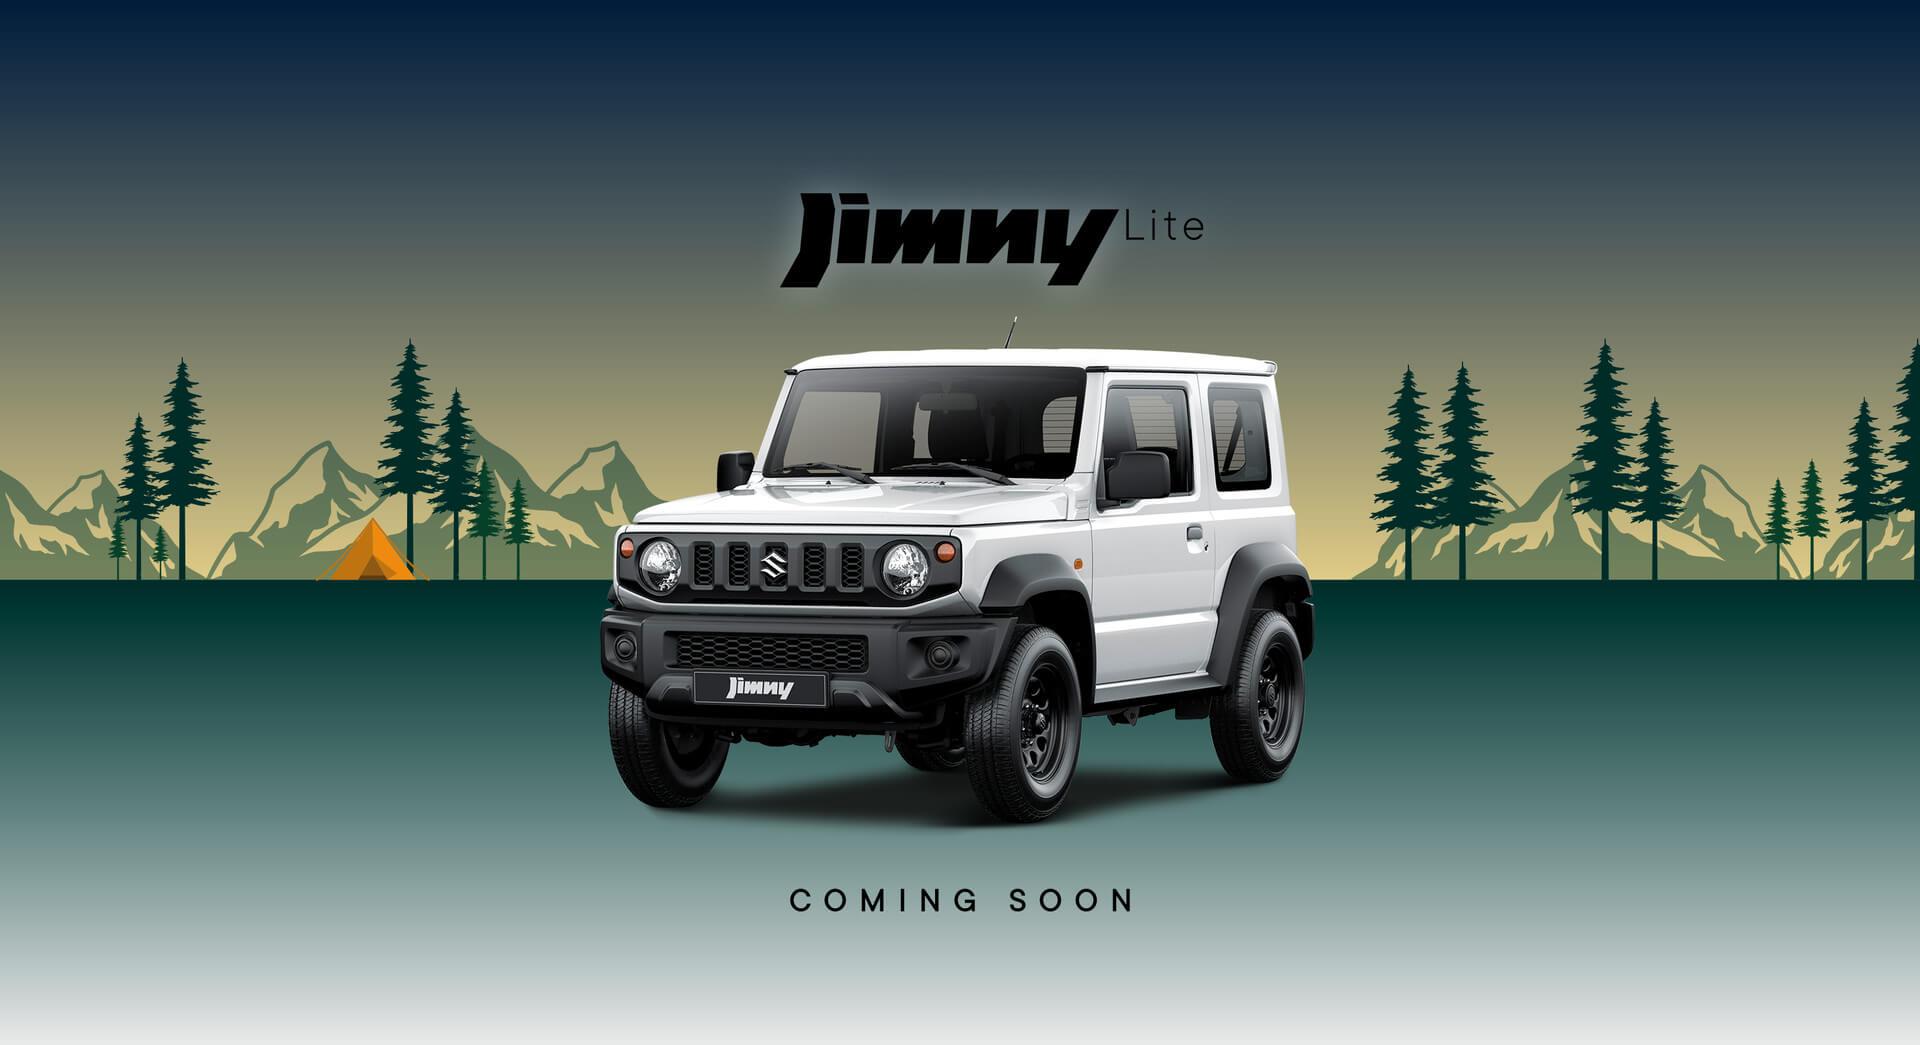 Jimny Lite - Coming Soon